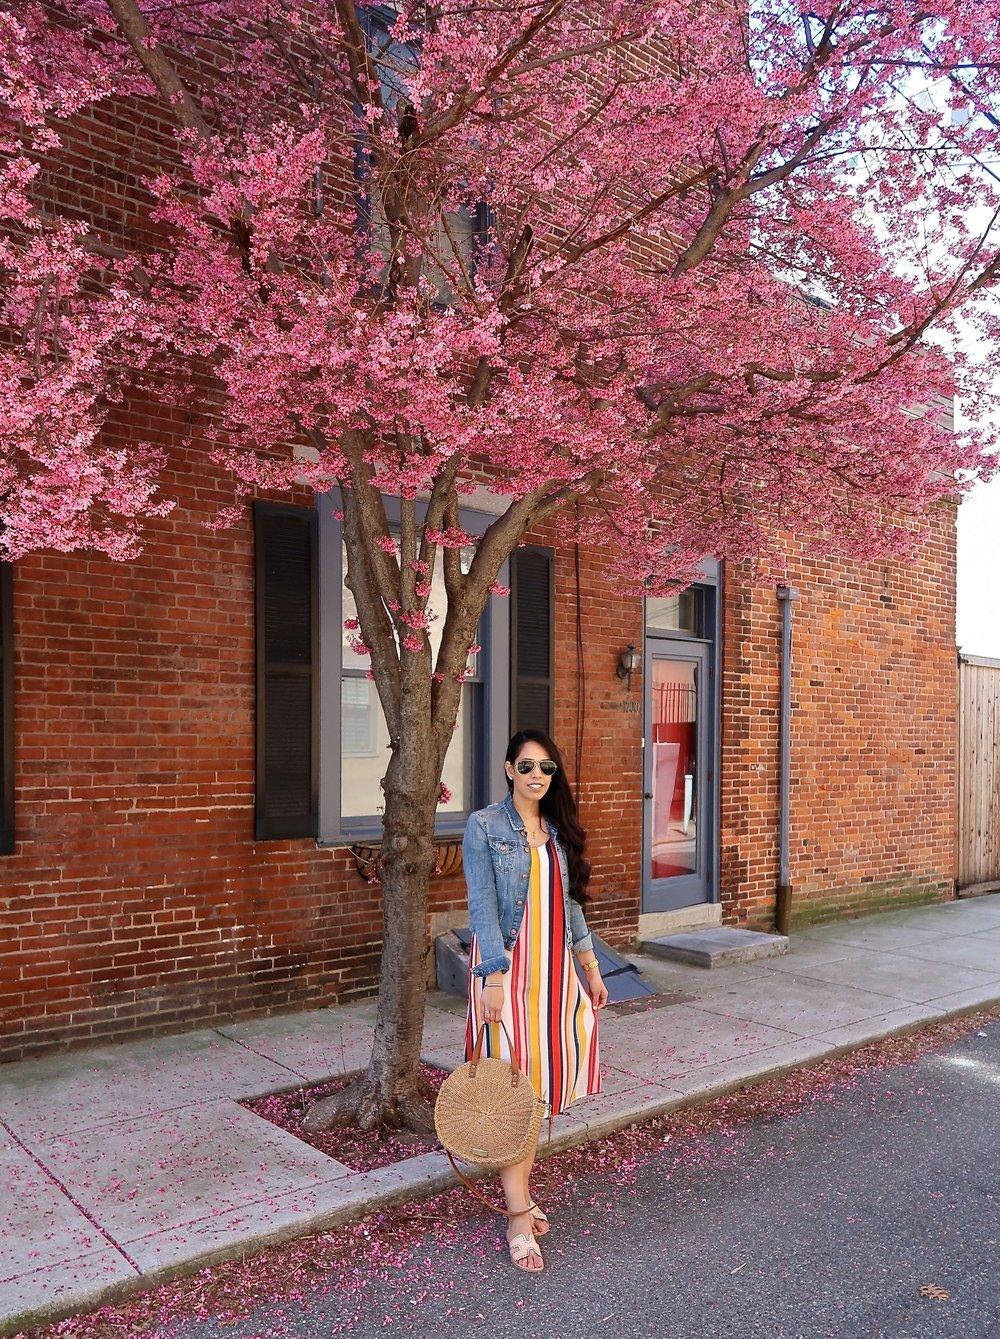 Colorful-Striped-Dresses-for-Spring.jpg